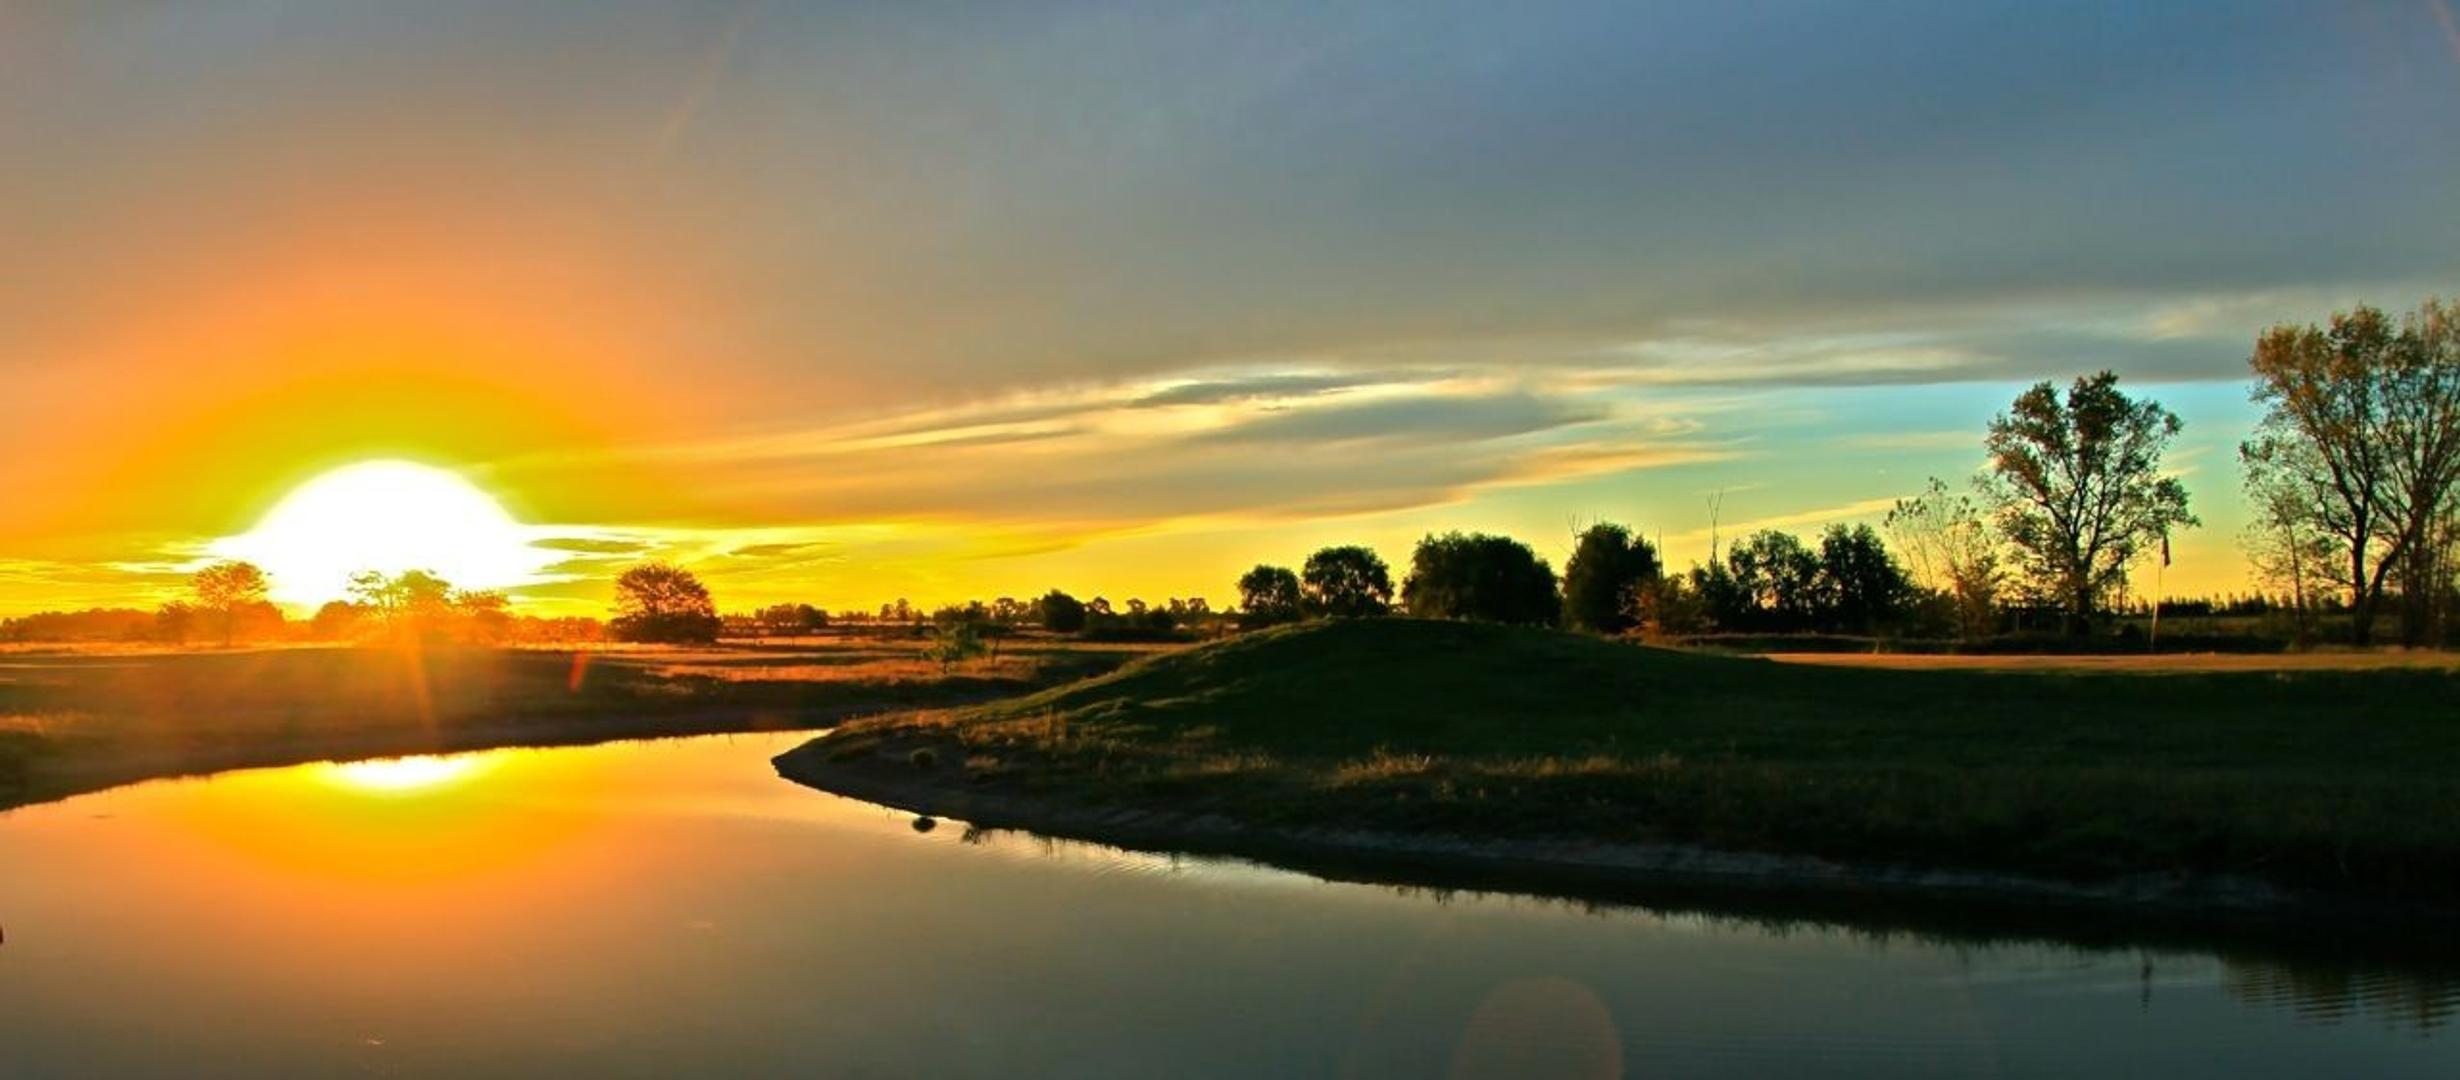 Tizado Pilar vende lotes al golf en Medal CC, Pilar y Alrededores - PIL3849_LP172617_1